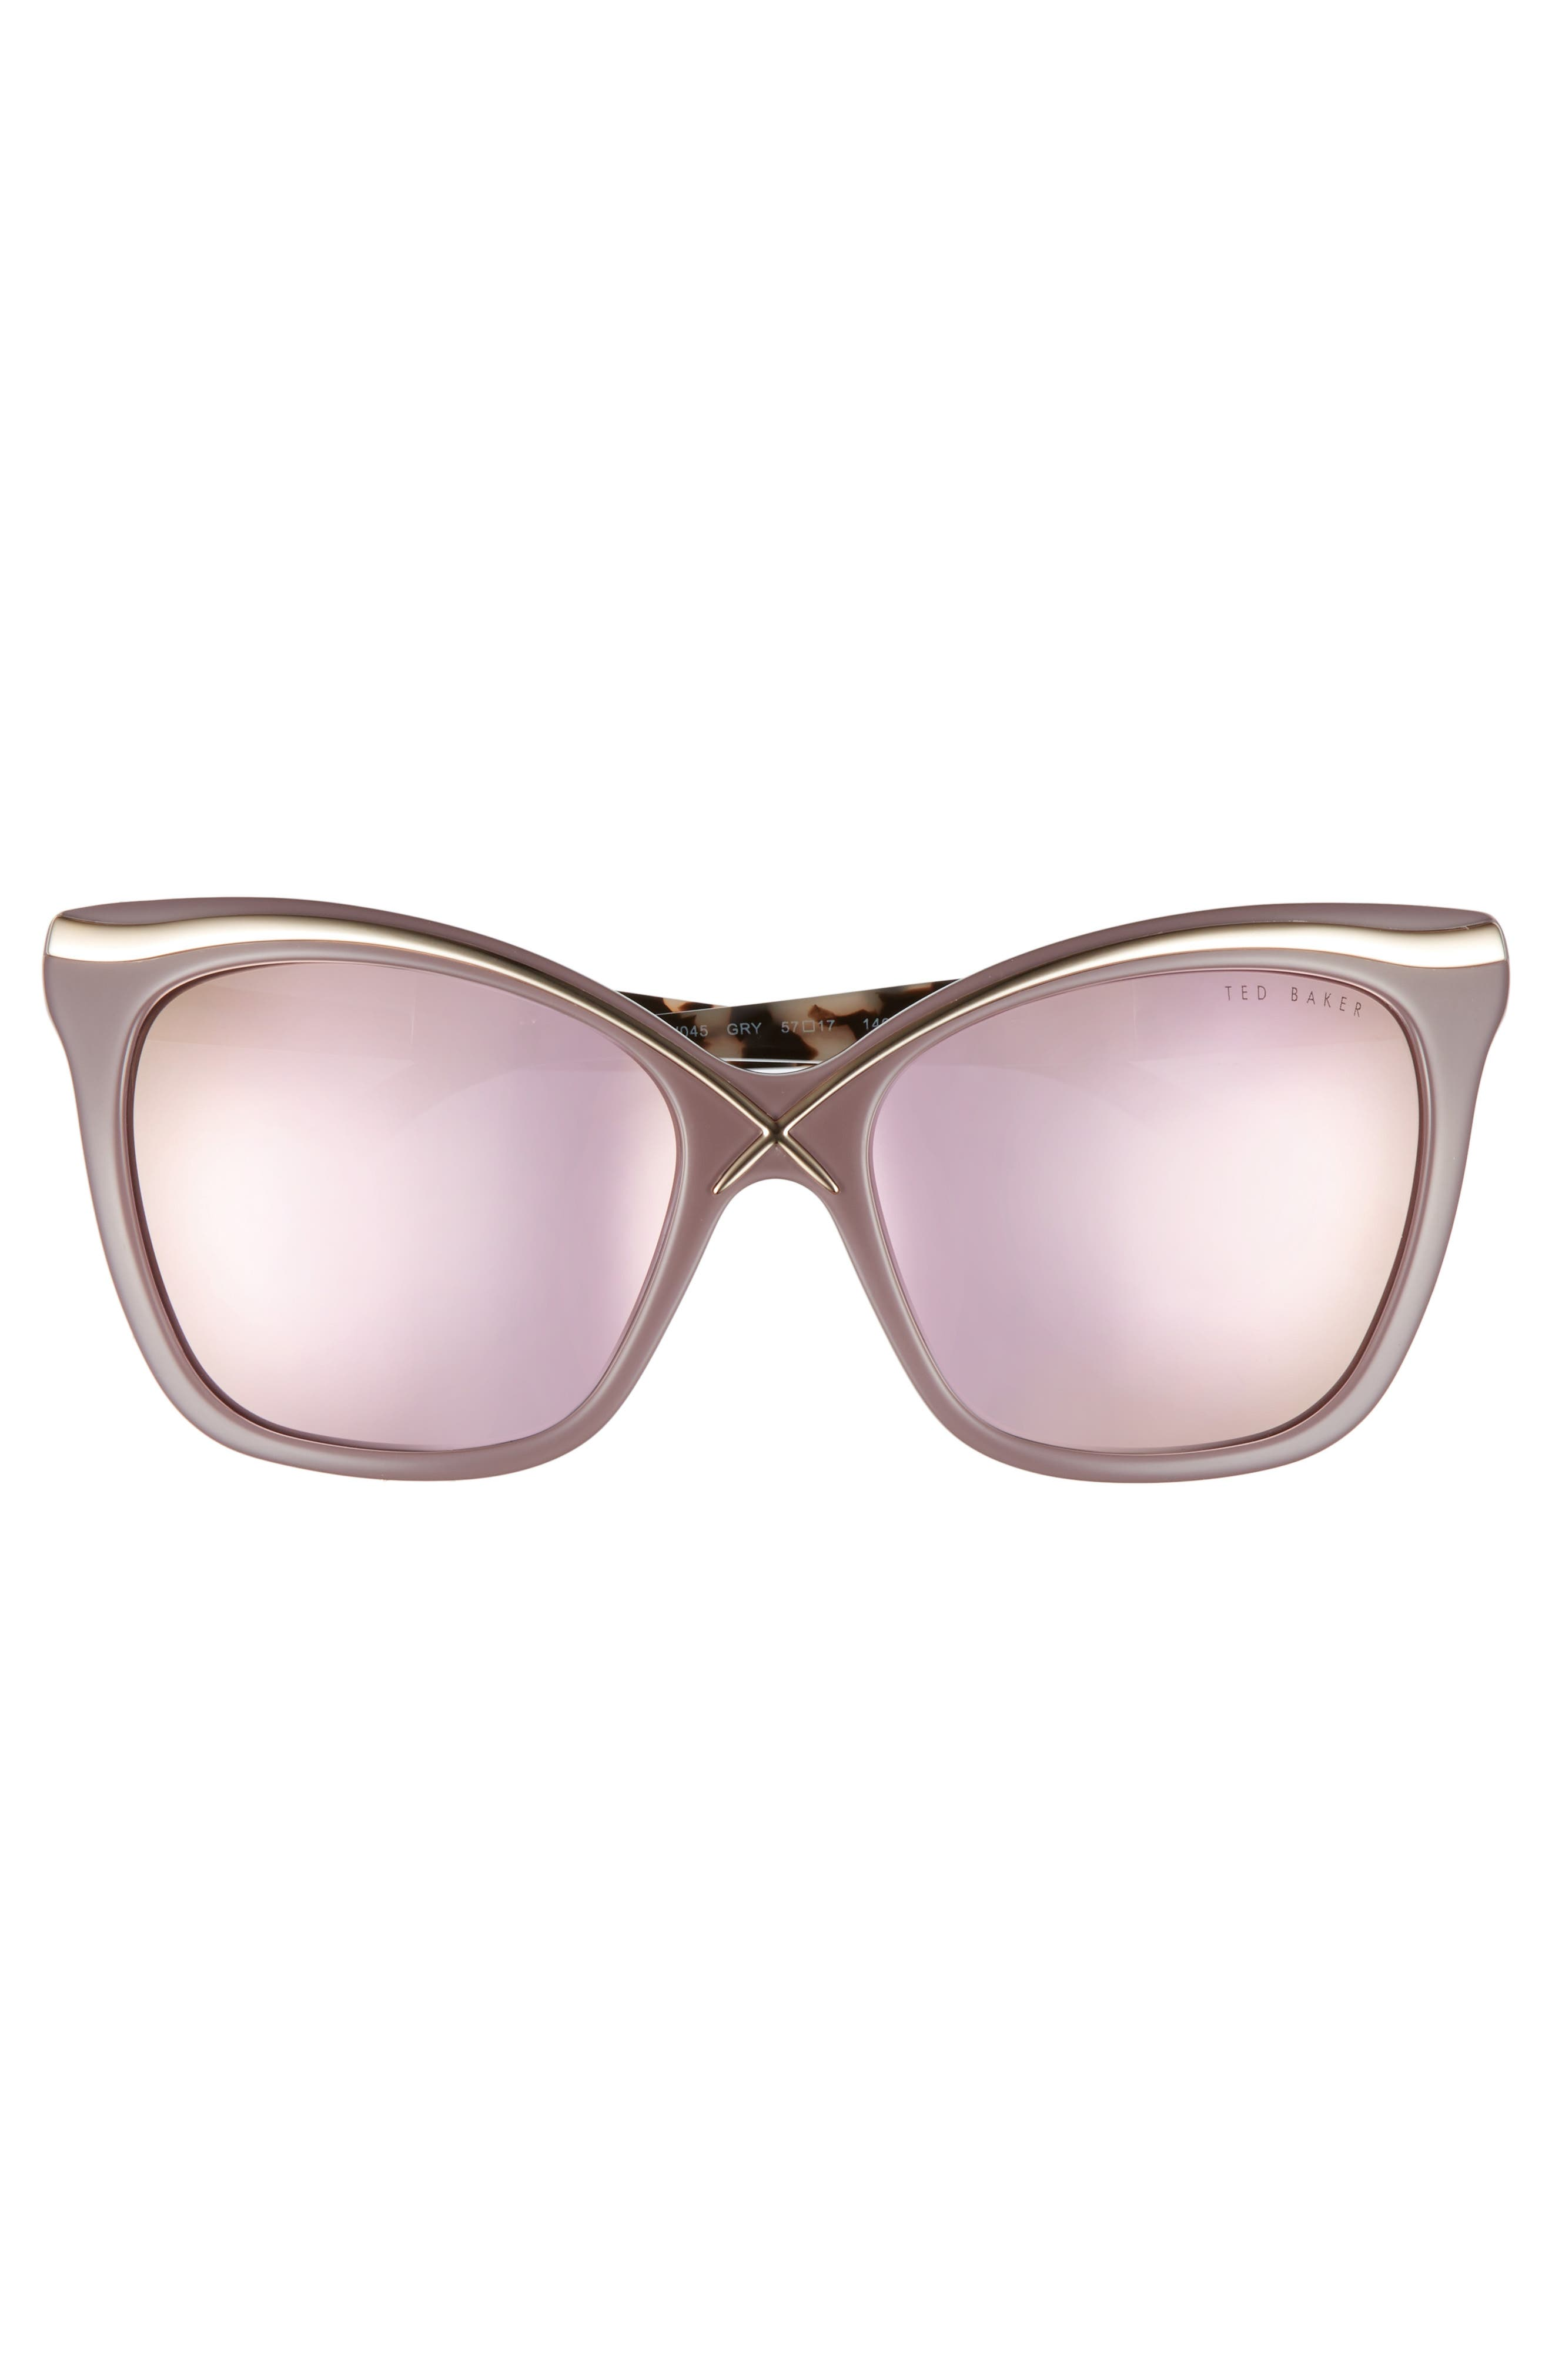 57mm Square Cat Eye Sunglasses,                             Alternate thumbnail 8, color,